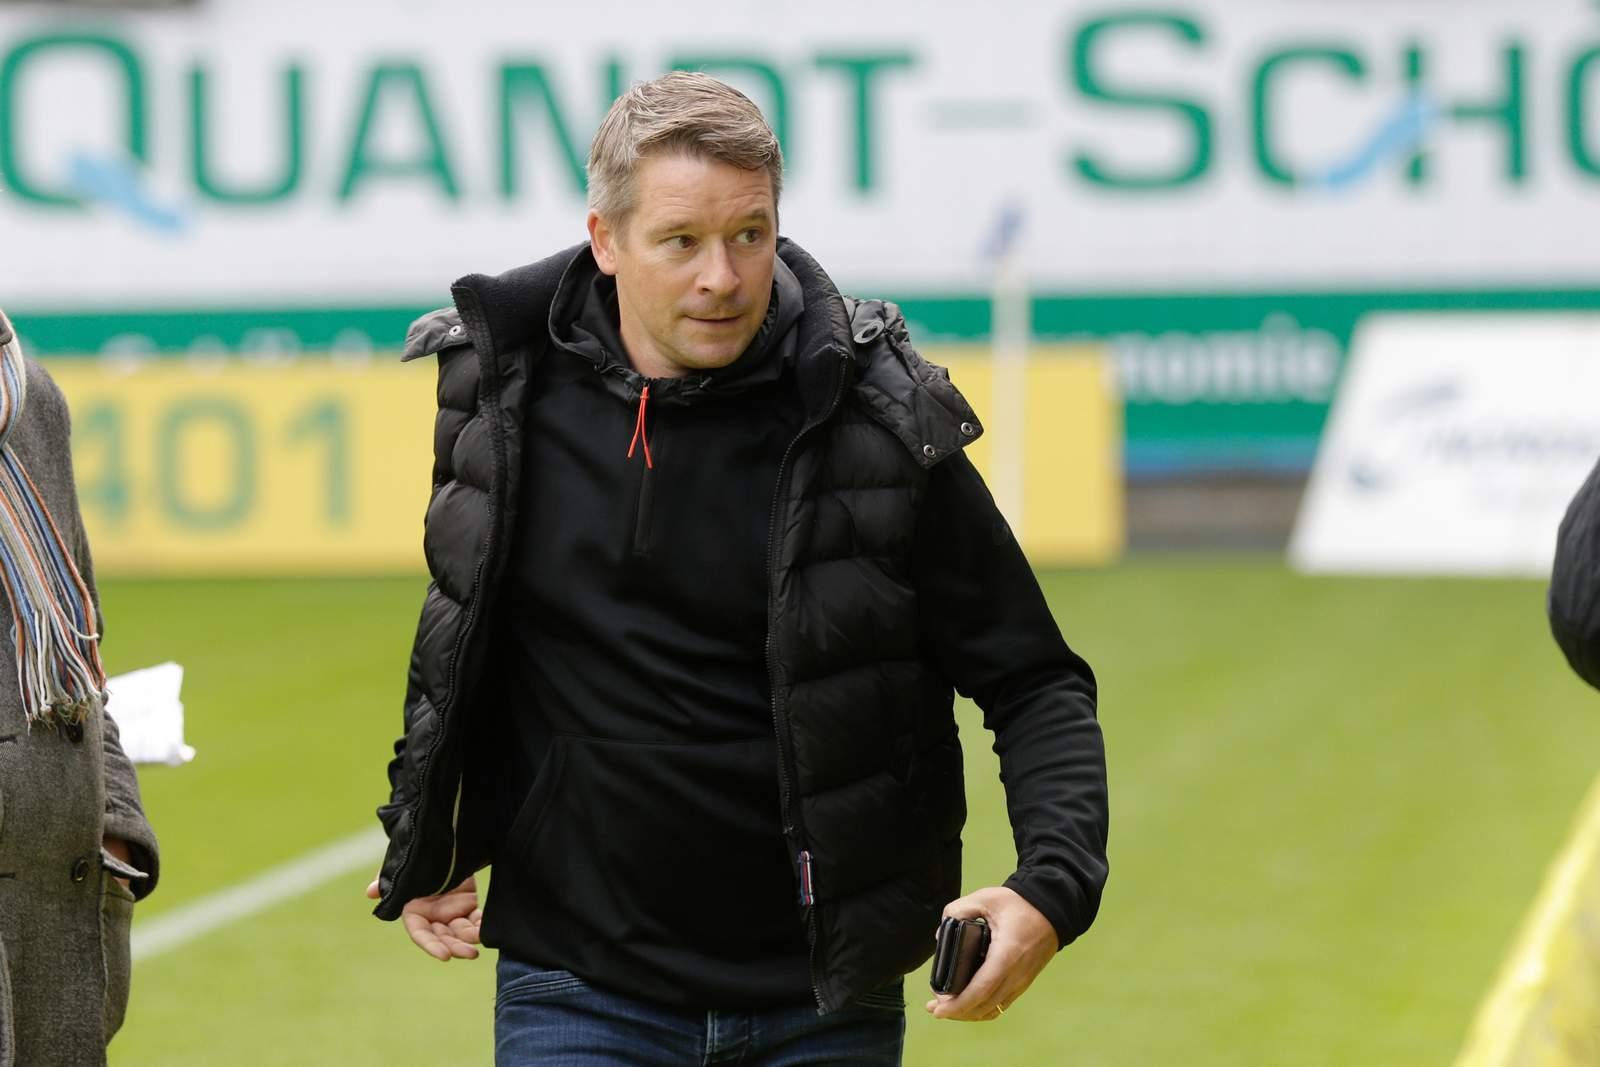 Geschäftsführer Ronald Maul vom SV Meppen